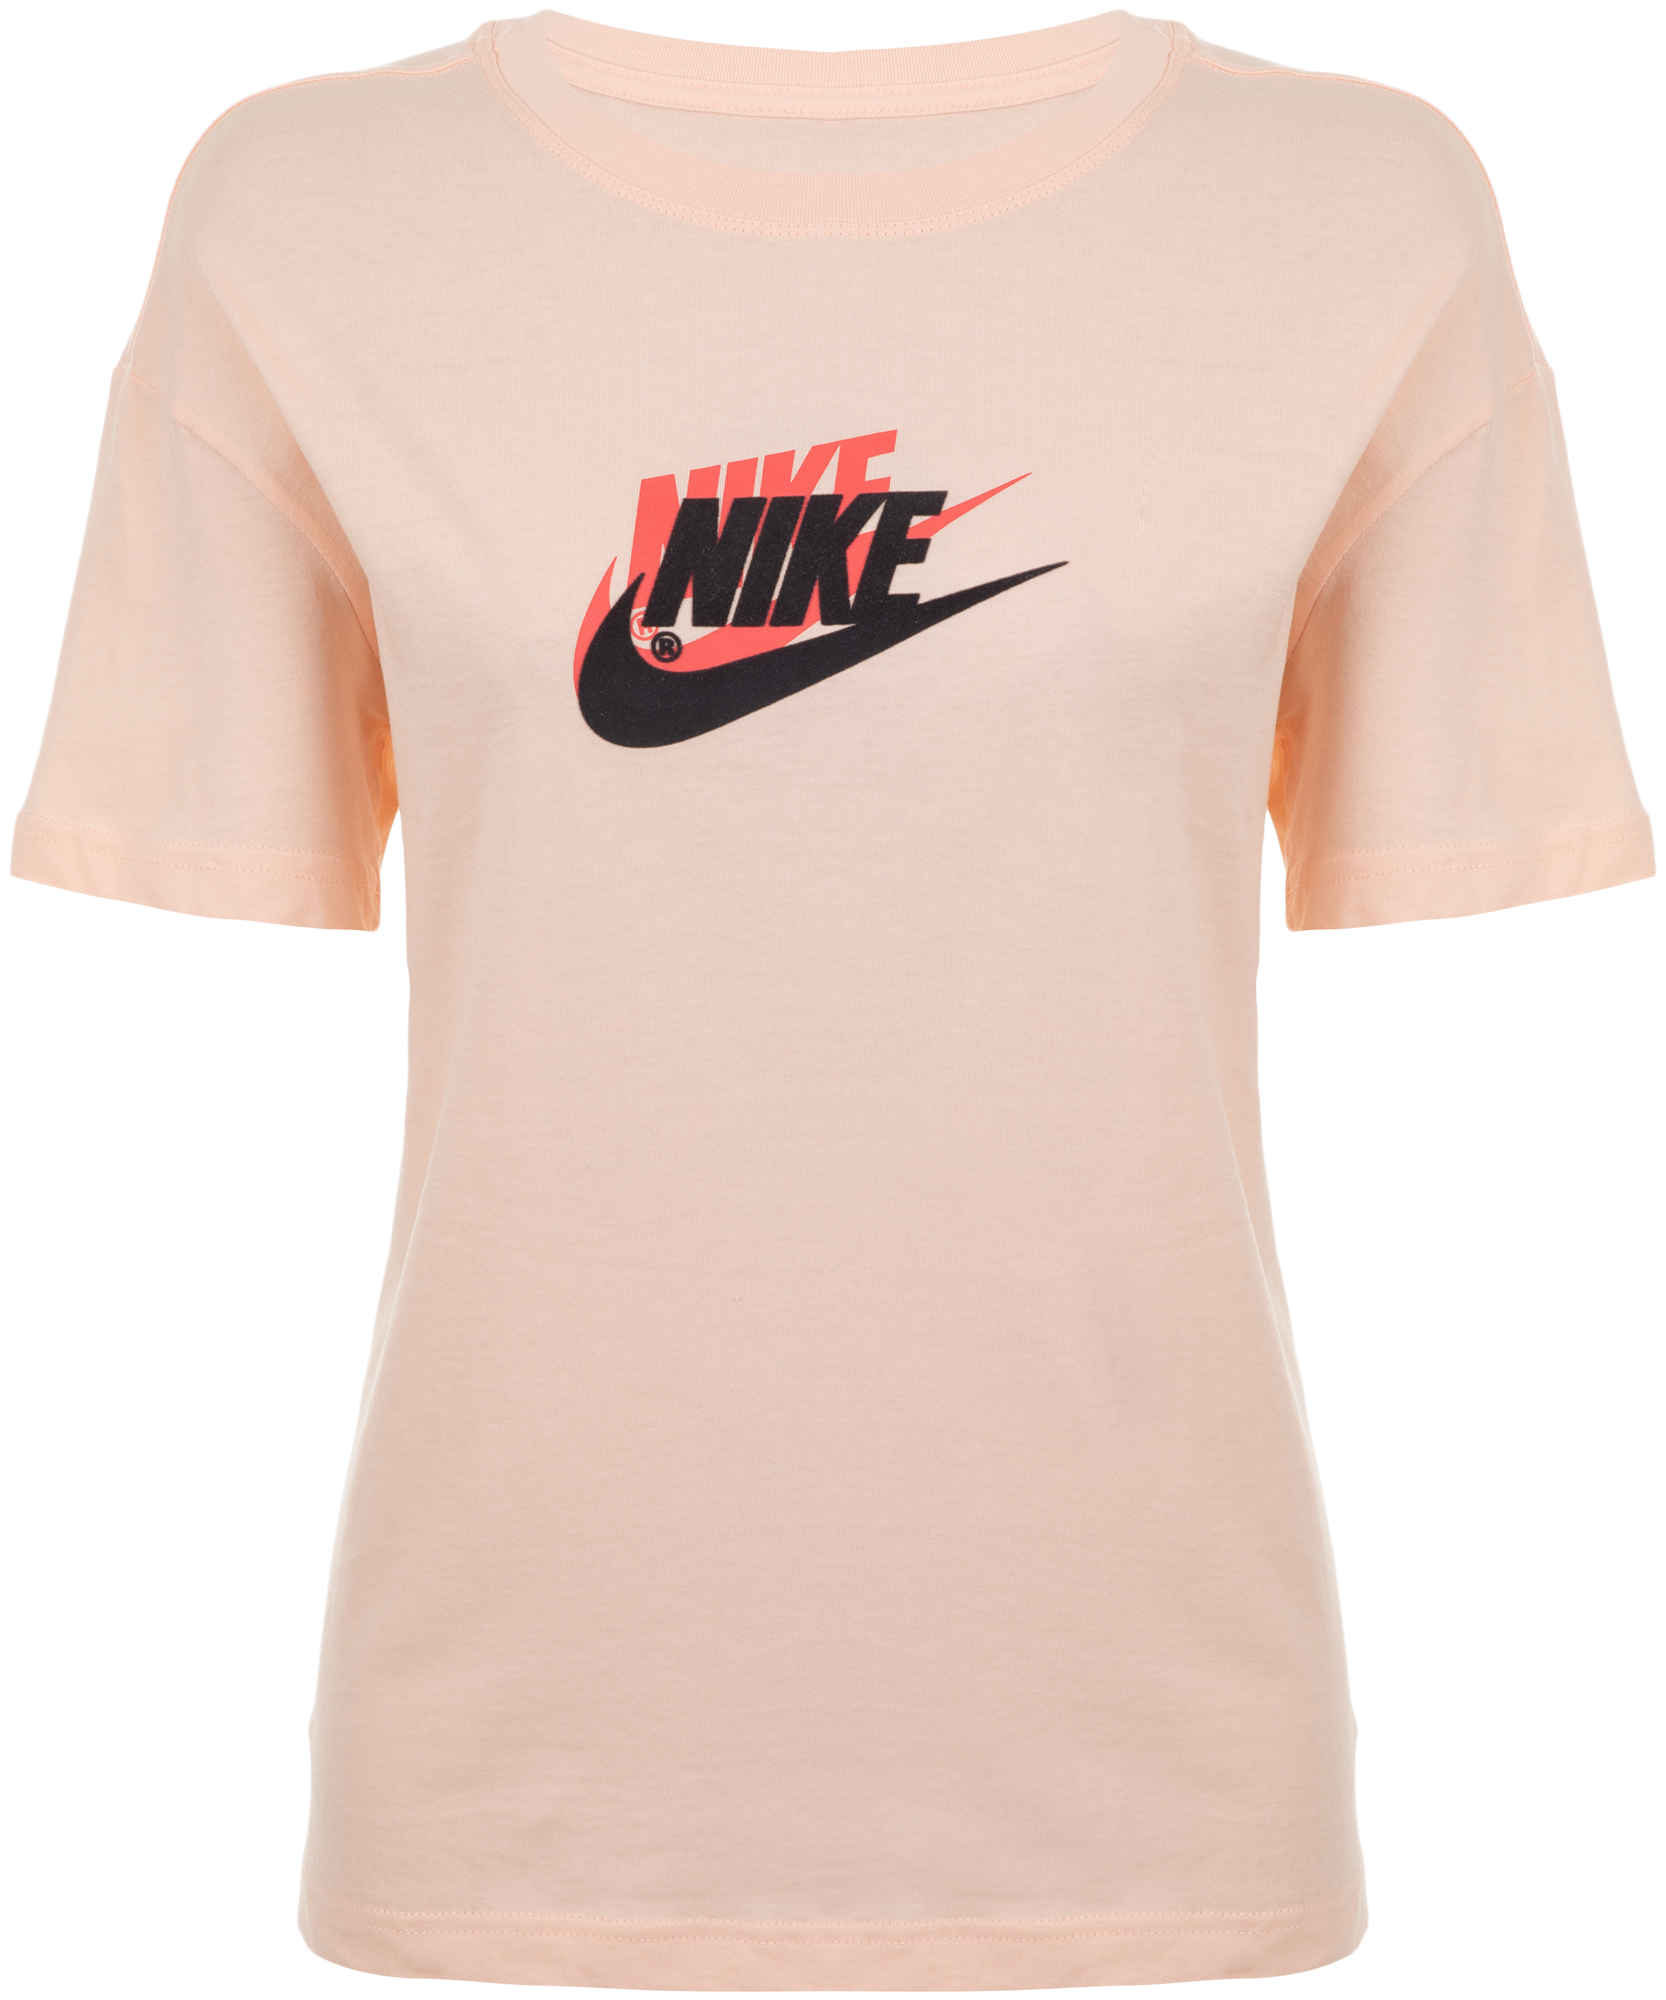 Nike Футболка женская Nike Sportswear, размер 46-48 цены онлайн